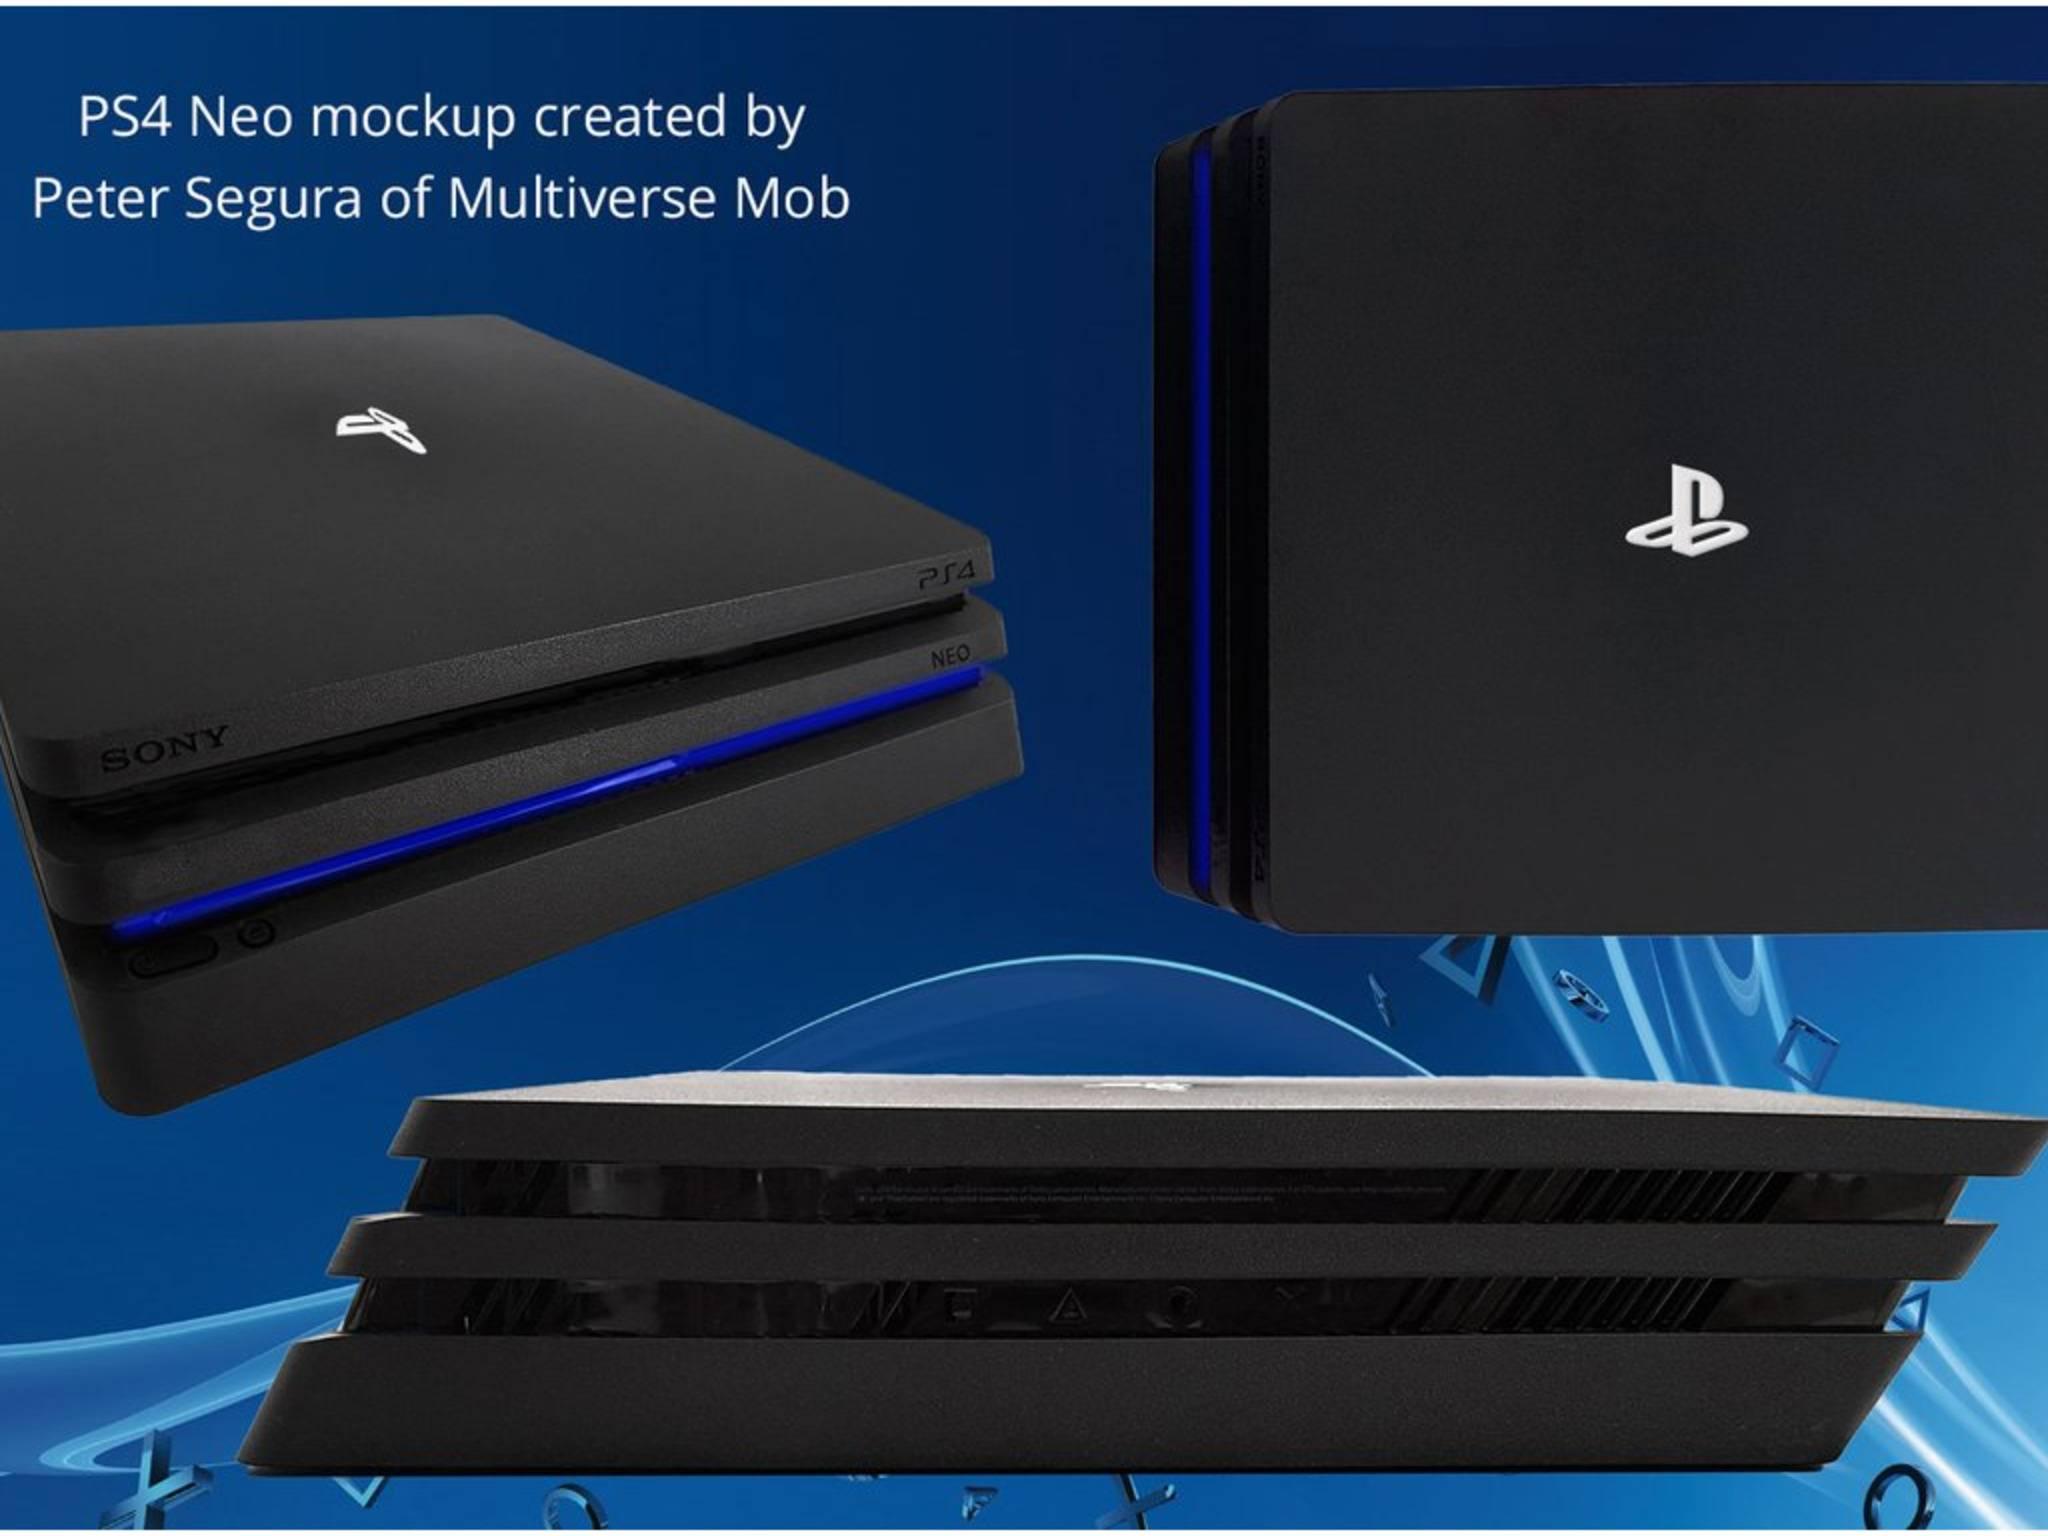 So soll die PS4 Neo laut Mockup aussehen.